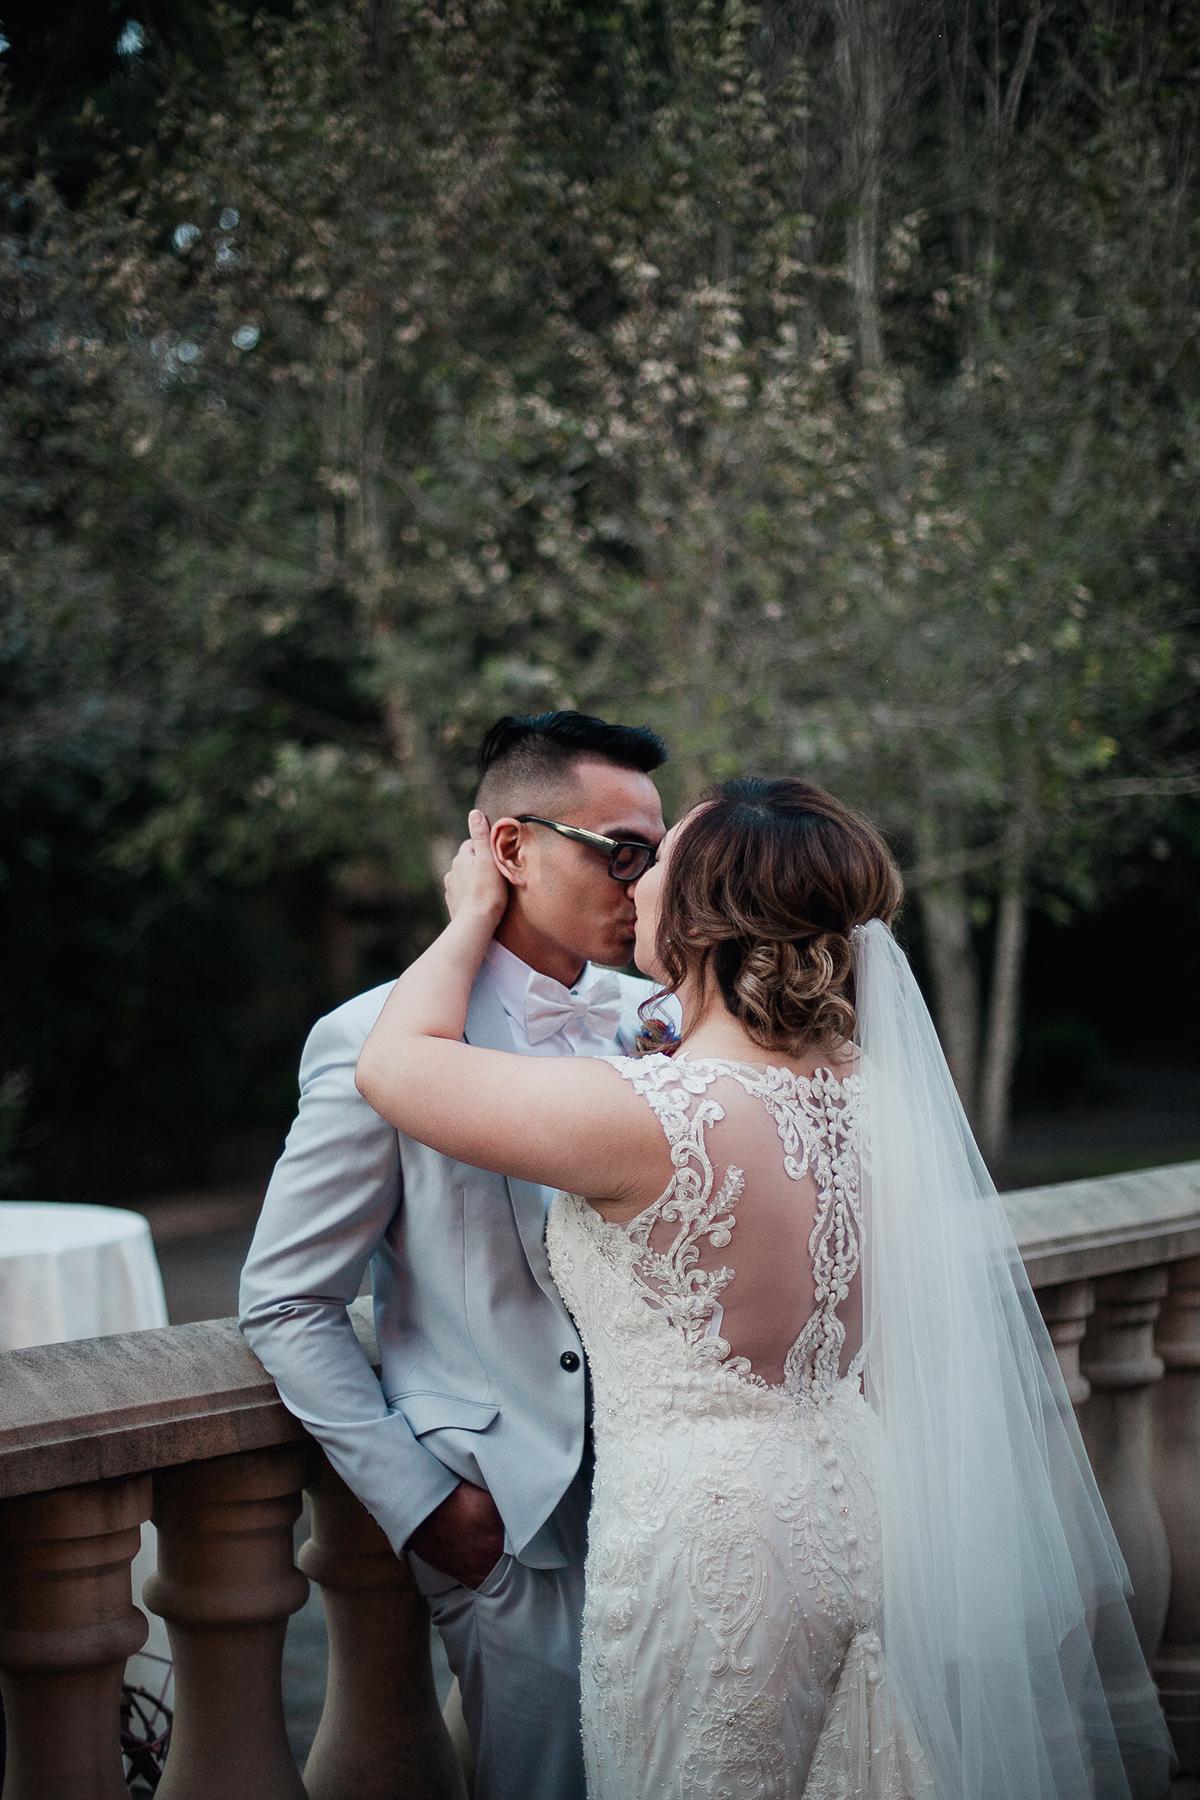 maricar_chester_wedding_069.jpg